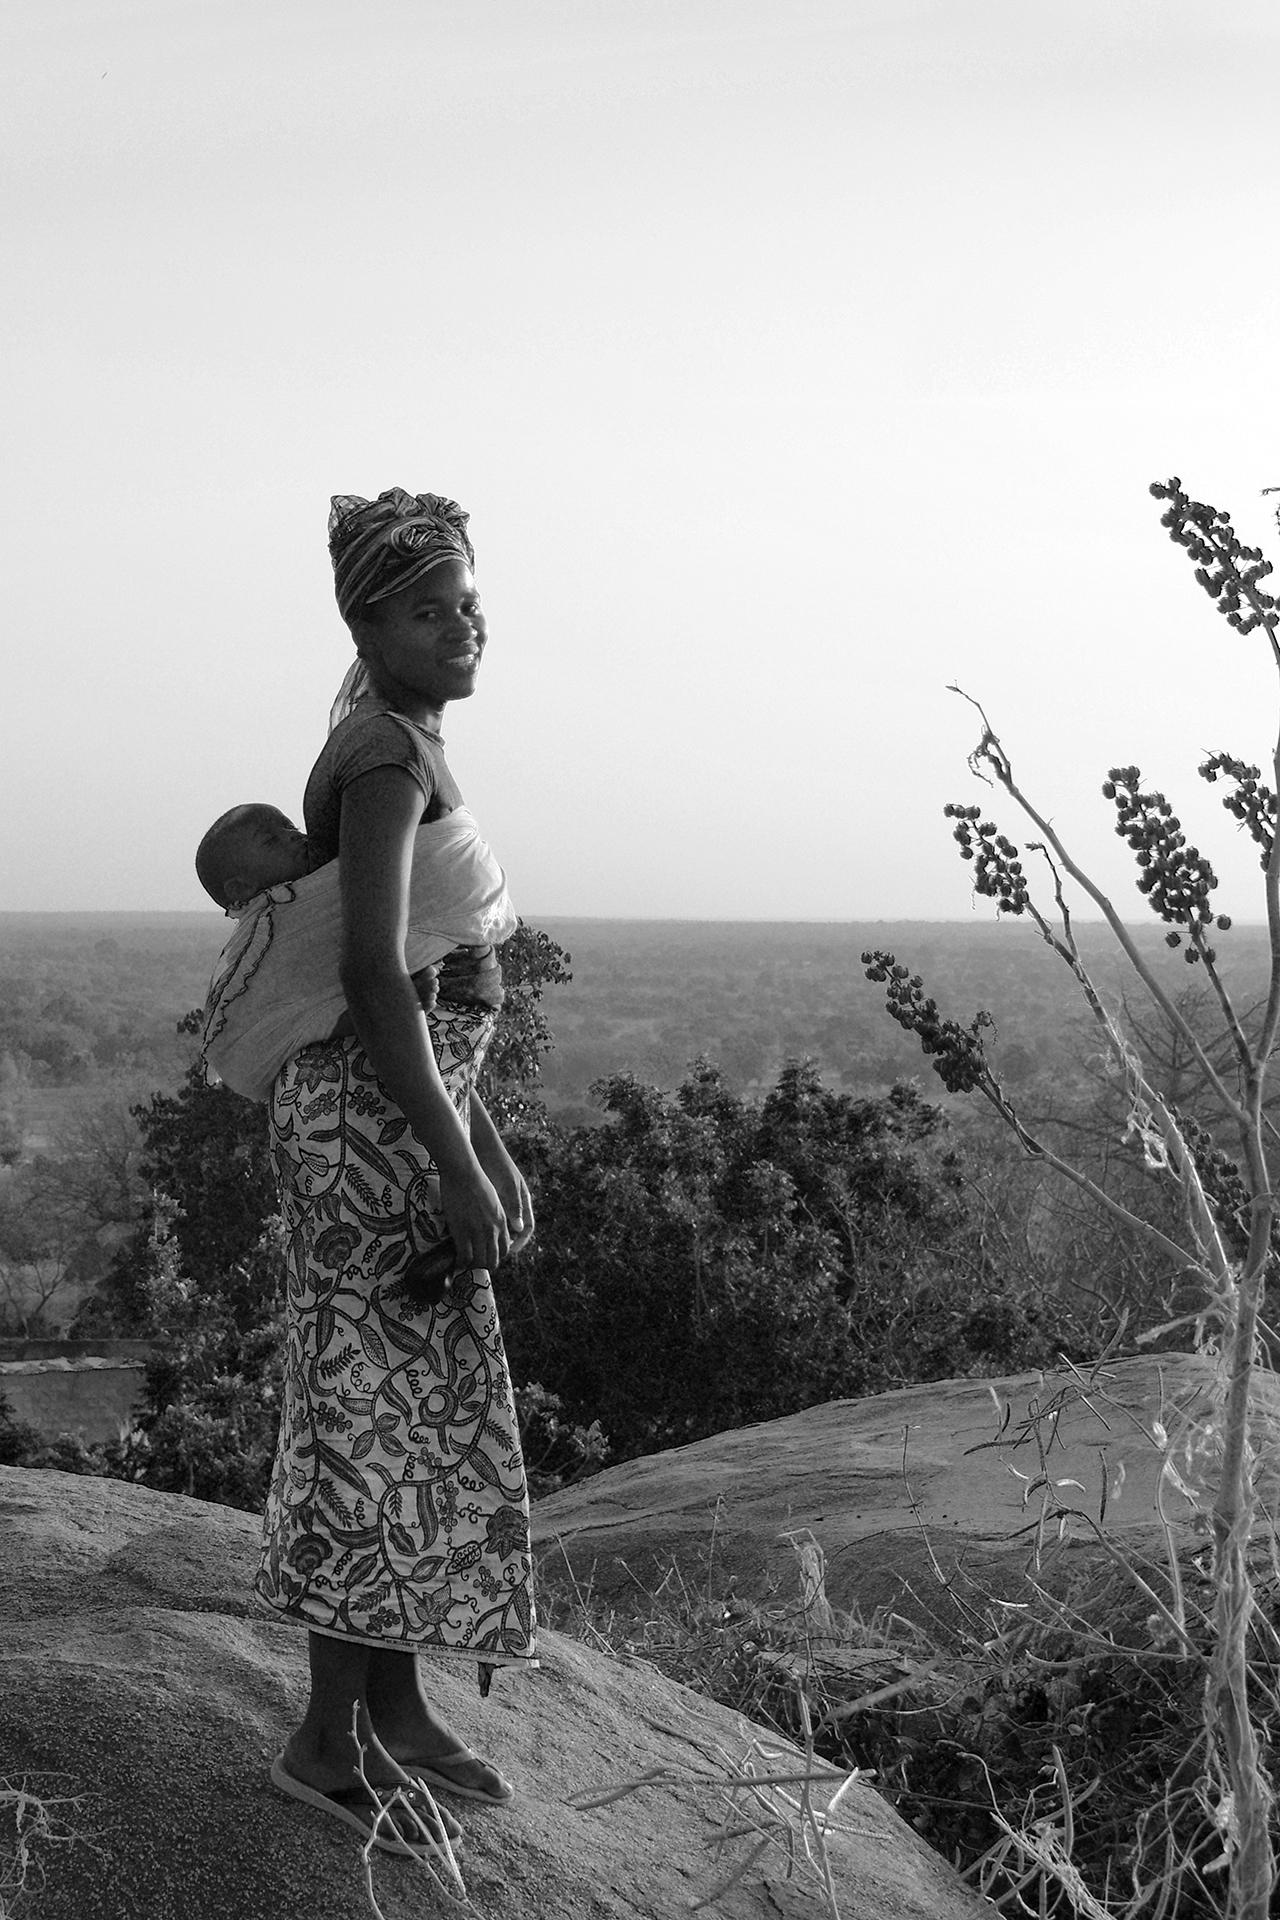 AWA, guide de grande randonnée. 2014 KORO, région de BOBO DIOULASSO, Burkina Faso